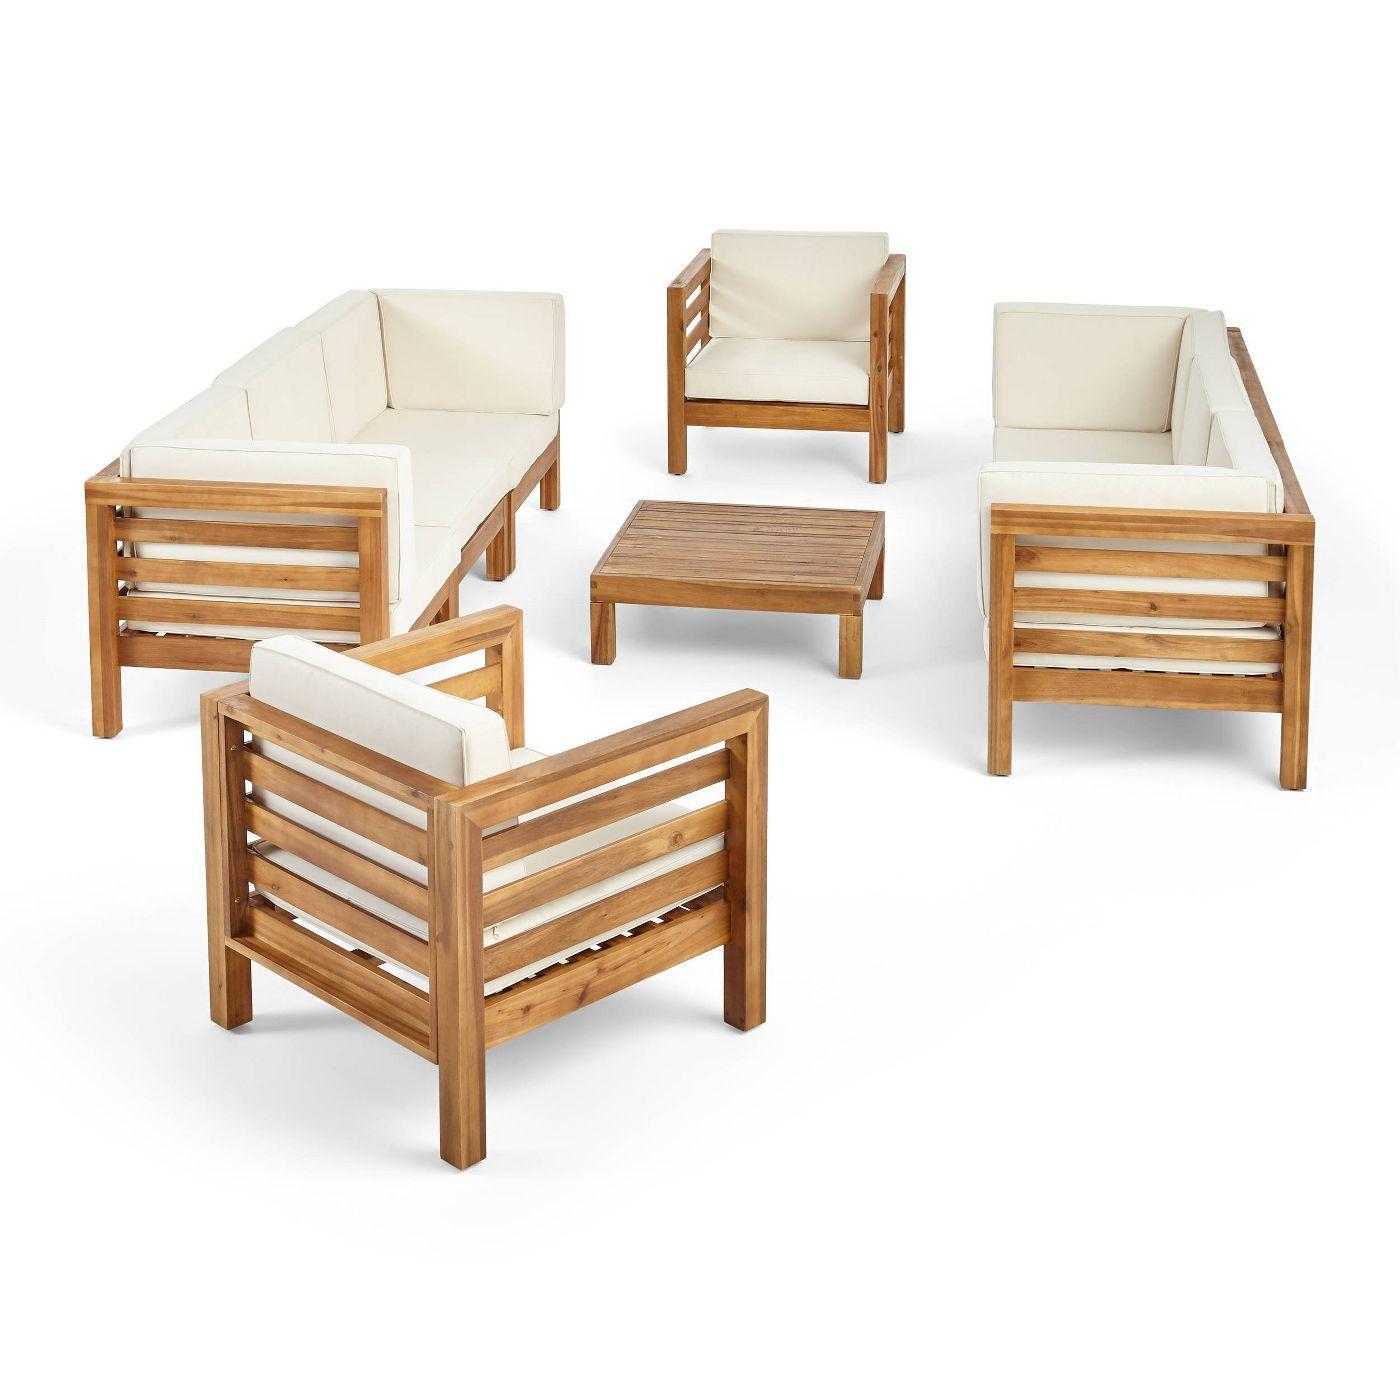 Oana 9pc Acacia Wood Sofa Club Chair Set Teak Beige Christopher Knight Home Wood Sofa Patio Furniture Deals Buy Outdoor Furniture